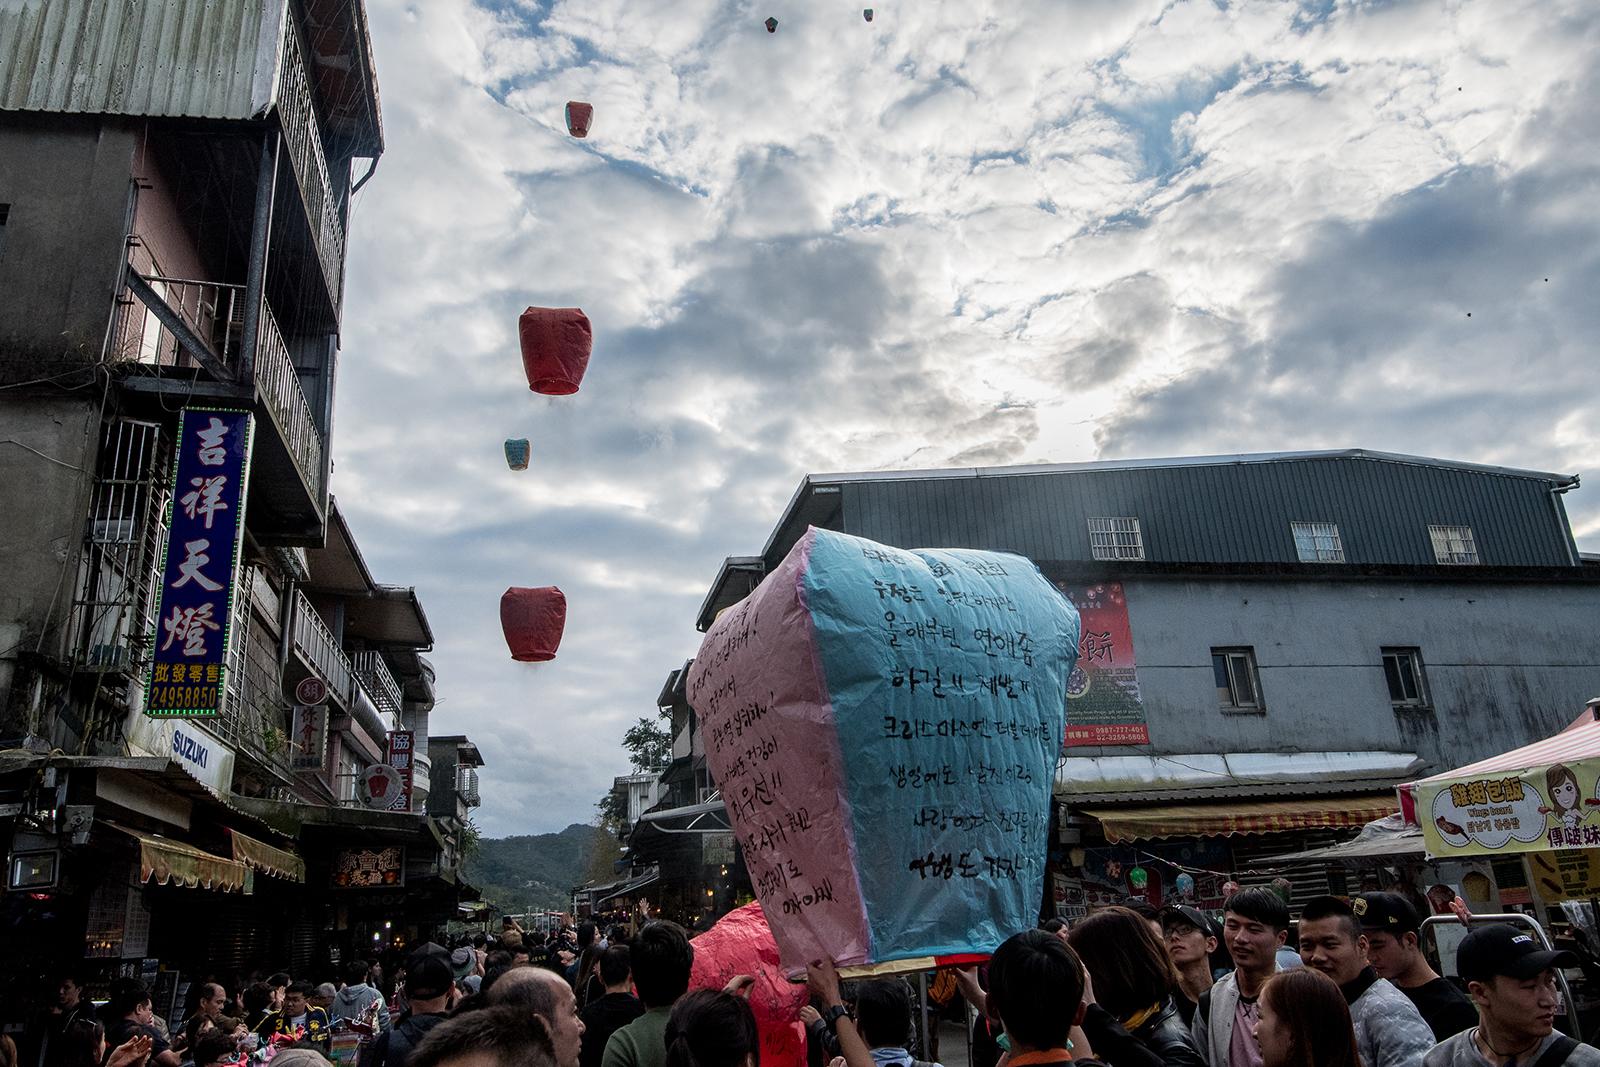 Pingxi lantern festival 2017 taiwan by Neil Ever Osborne